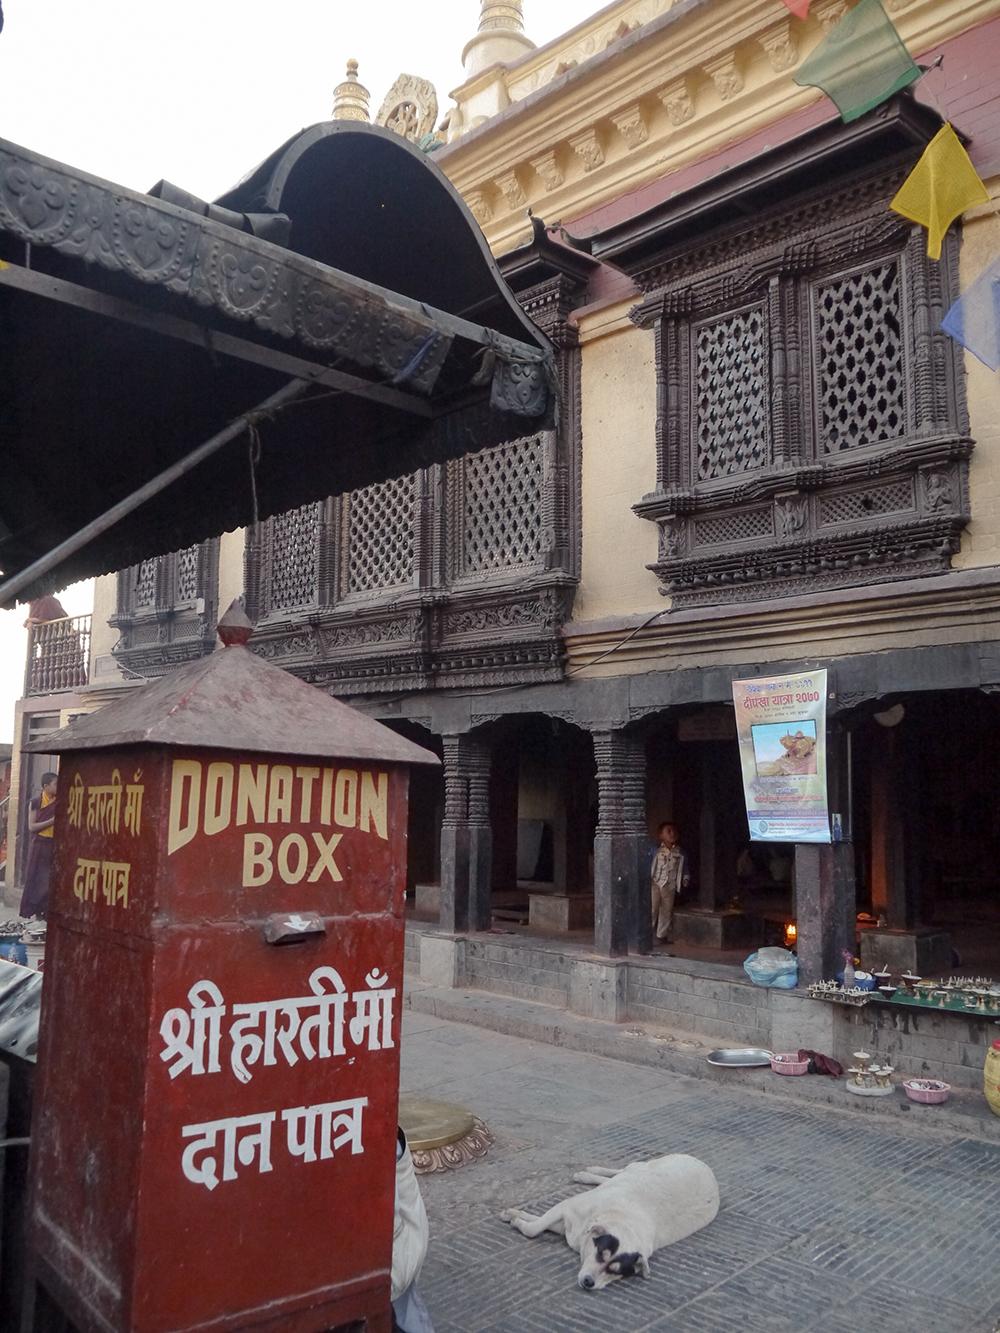 Trip to Nepal, nepal tourism, travel nepal, Kathmandu, Swayambhunath, activities in Kathmandu